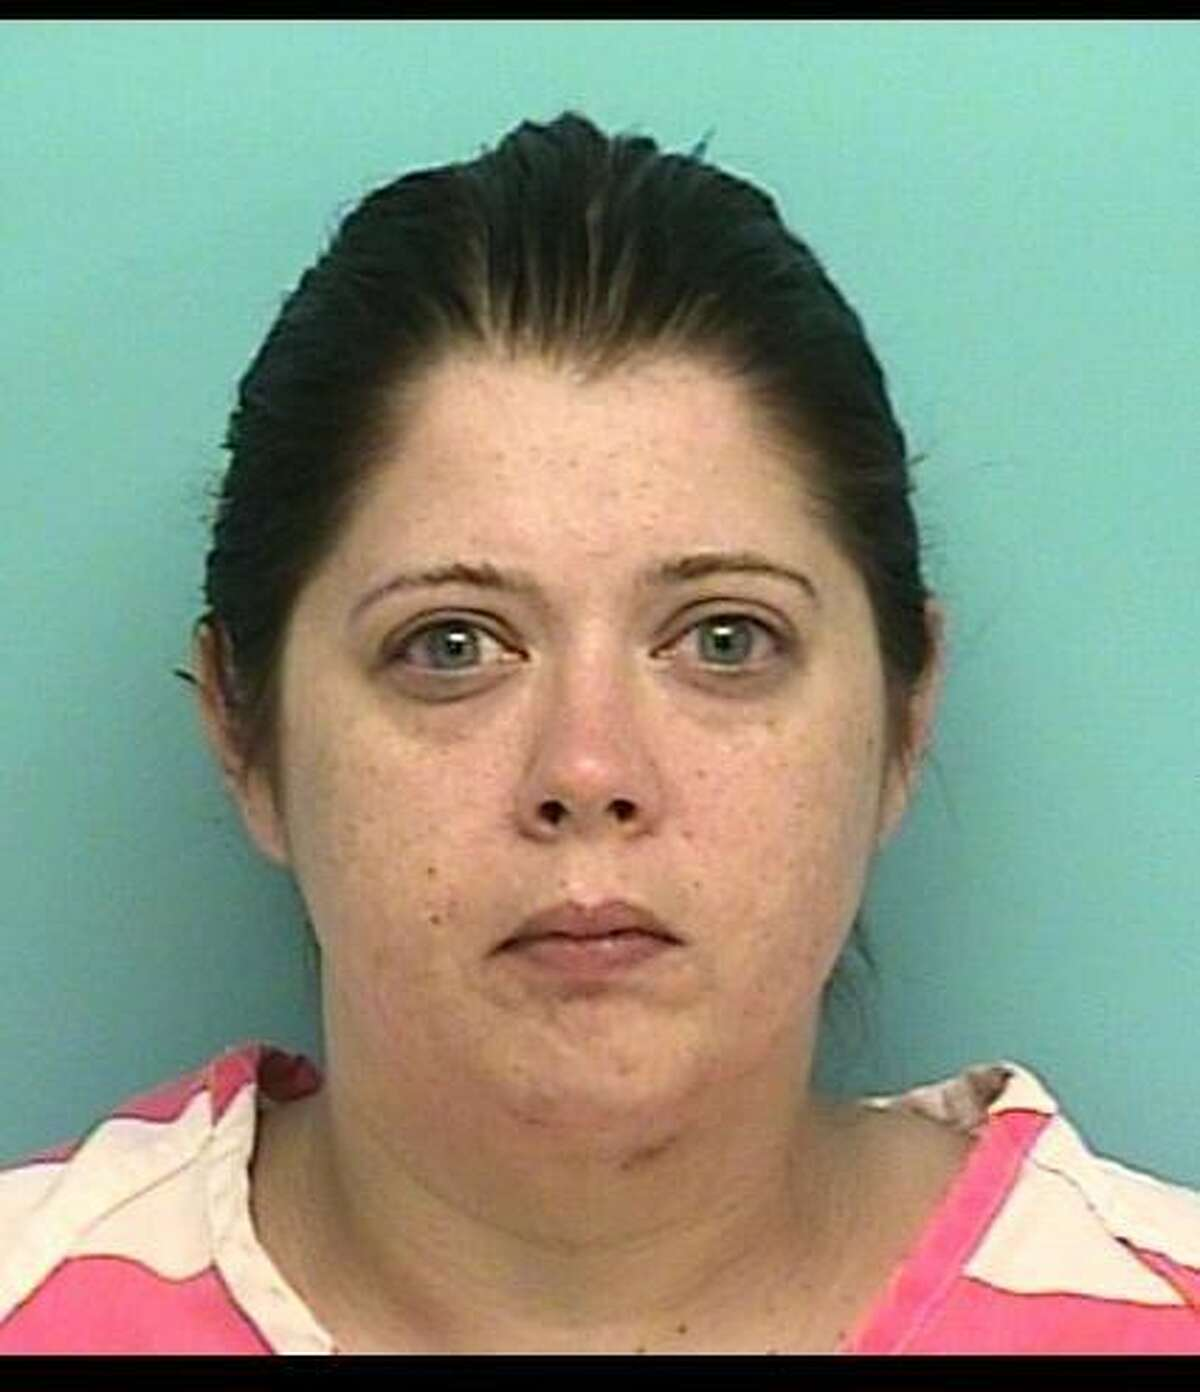 "CASLER, Melanie AmberWhite/Female DOB: 05/27/1977Height: 5'03"" Weight: 209 lbs.Hair: Brown Eyes: BlueWarrant: # 120404531 Bond ForfeitureTheftLKA: Timberlane, Humble."